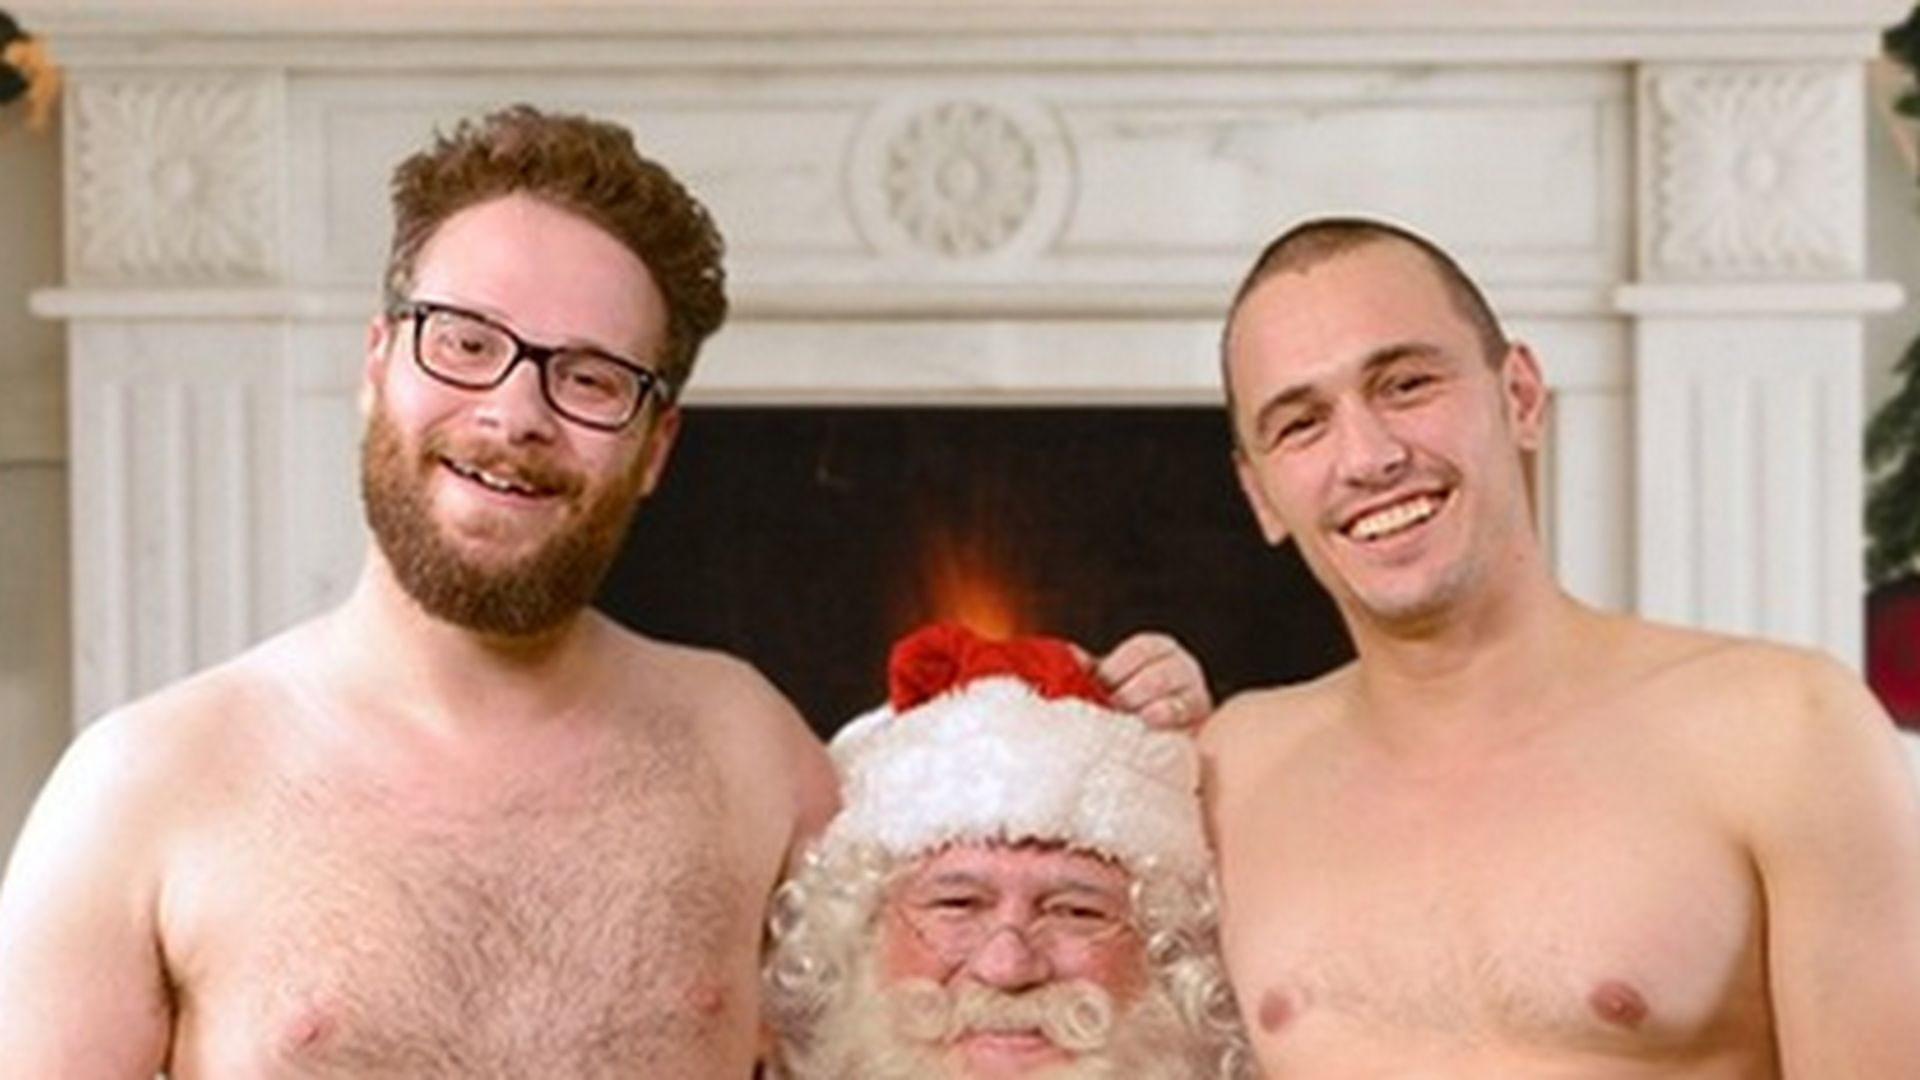 Schamlos! James Franco wünscht nackte Weihnachten | Promiflash.de